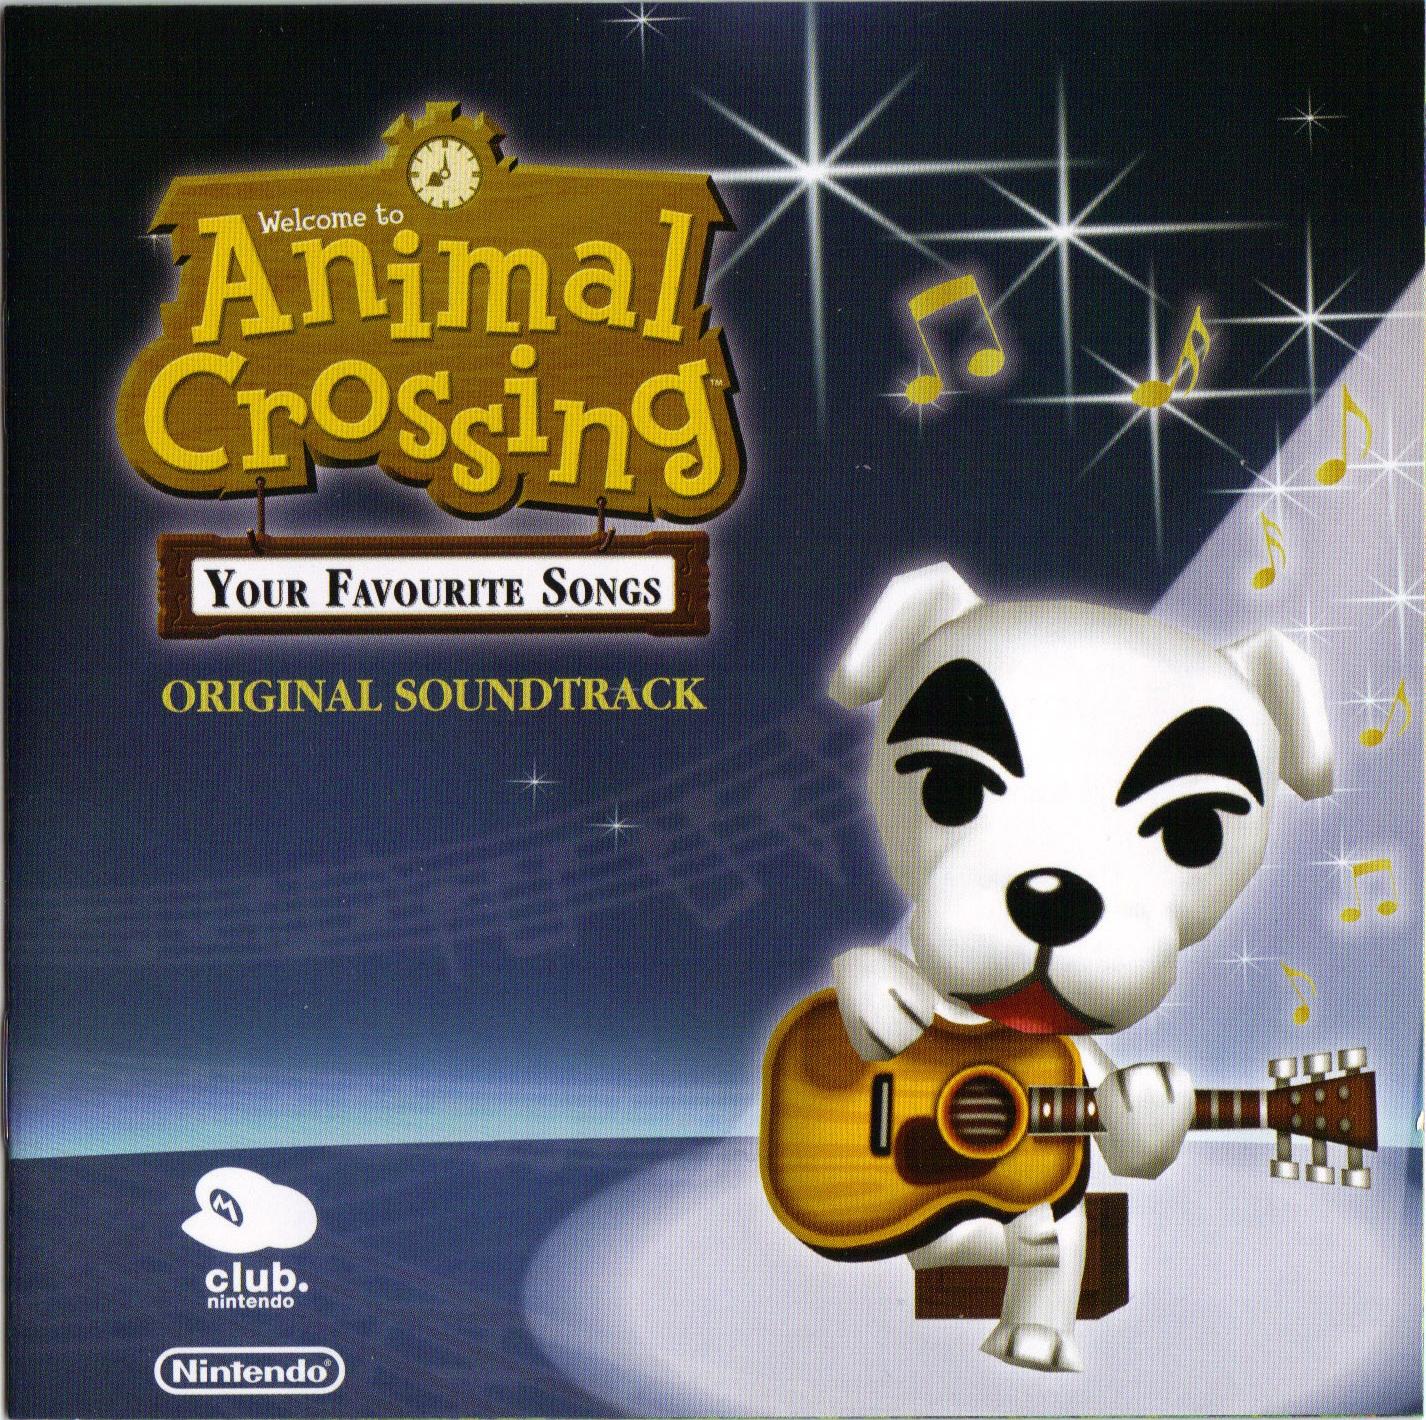 File:AnimalCrossingOriginalSoundtrackCover.jpg